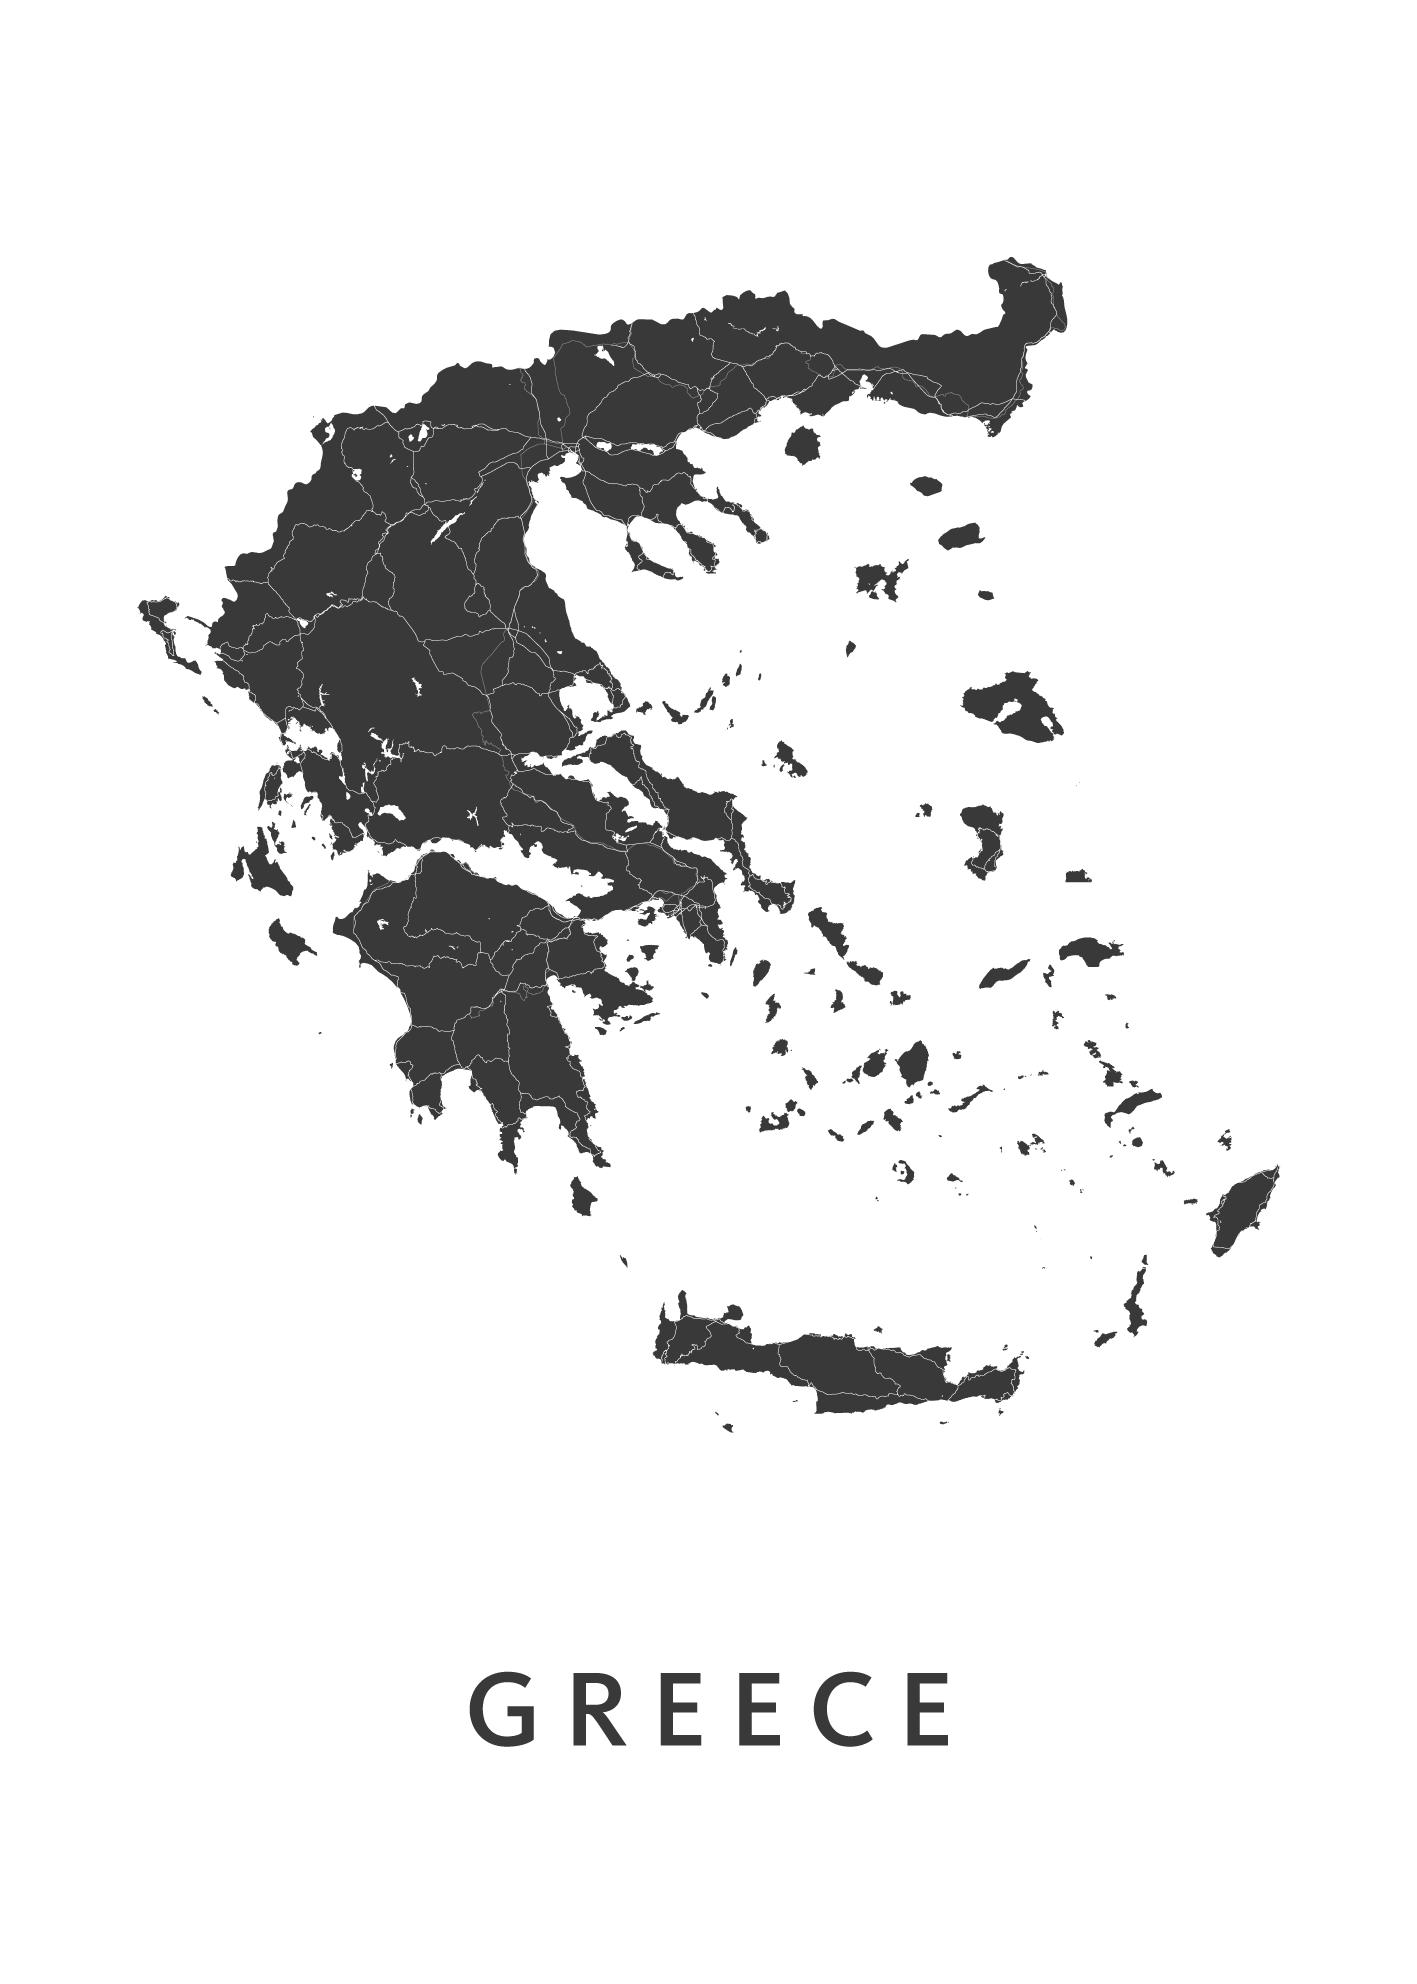 Greece Country Map stadskaart poster